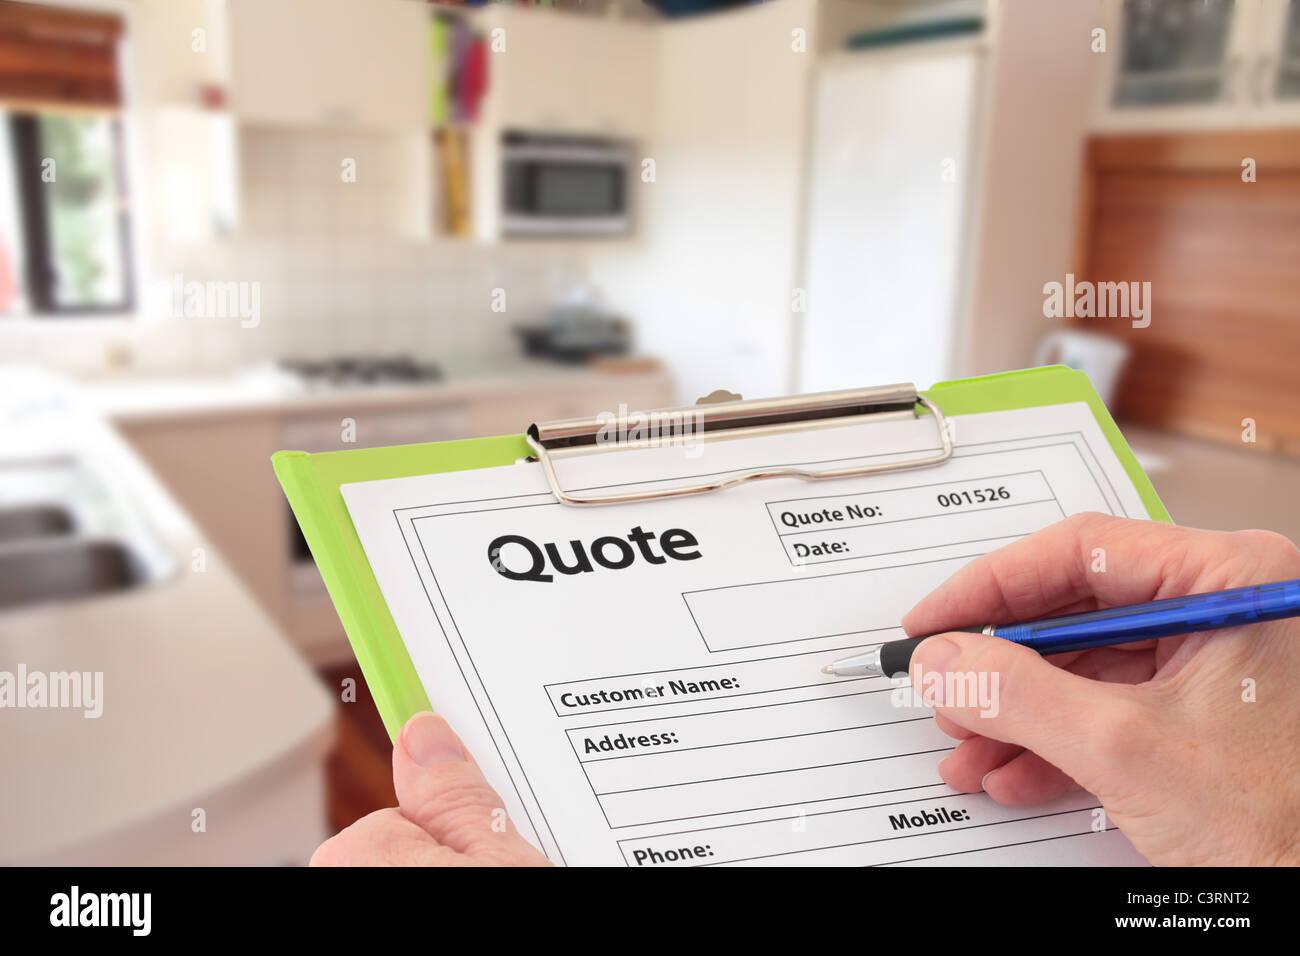 Home Quote Stockfotos & Home Quote Bilder - Alamy